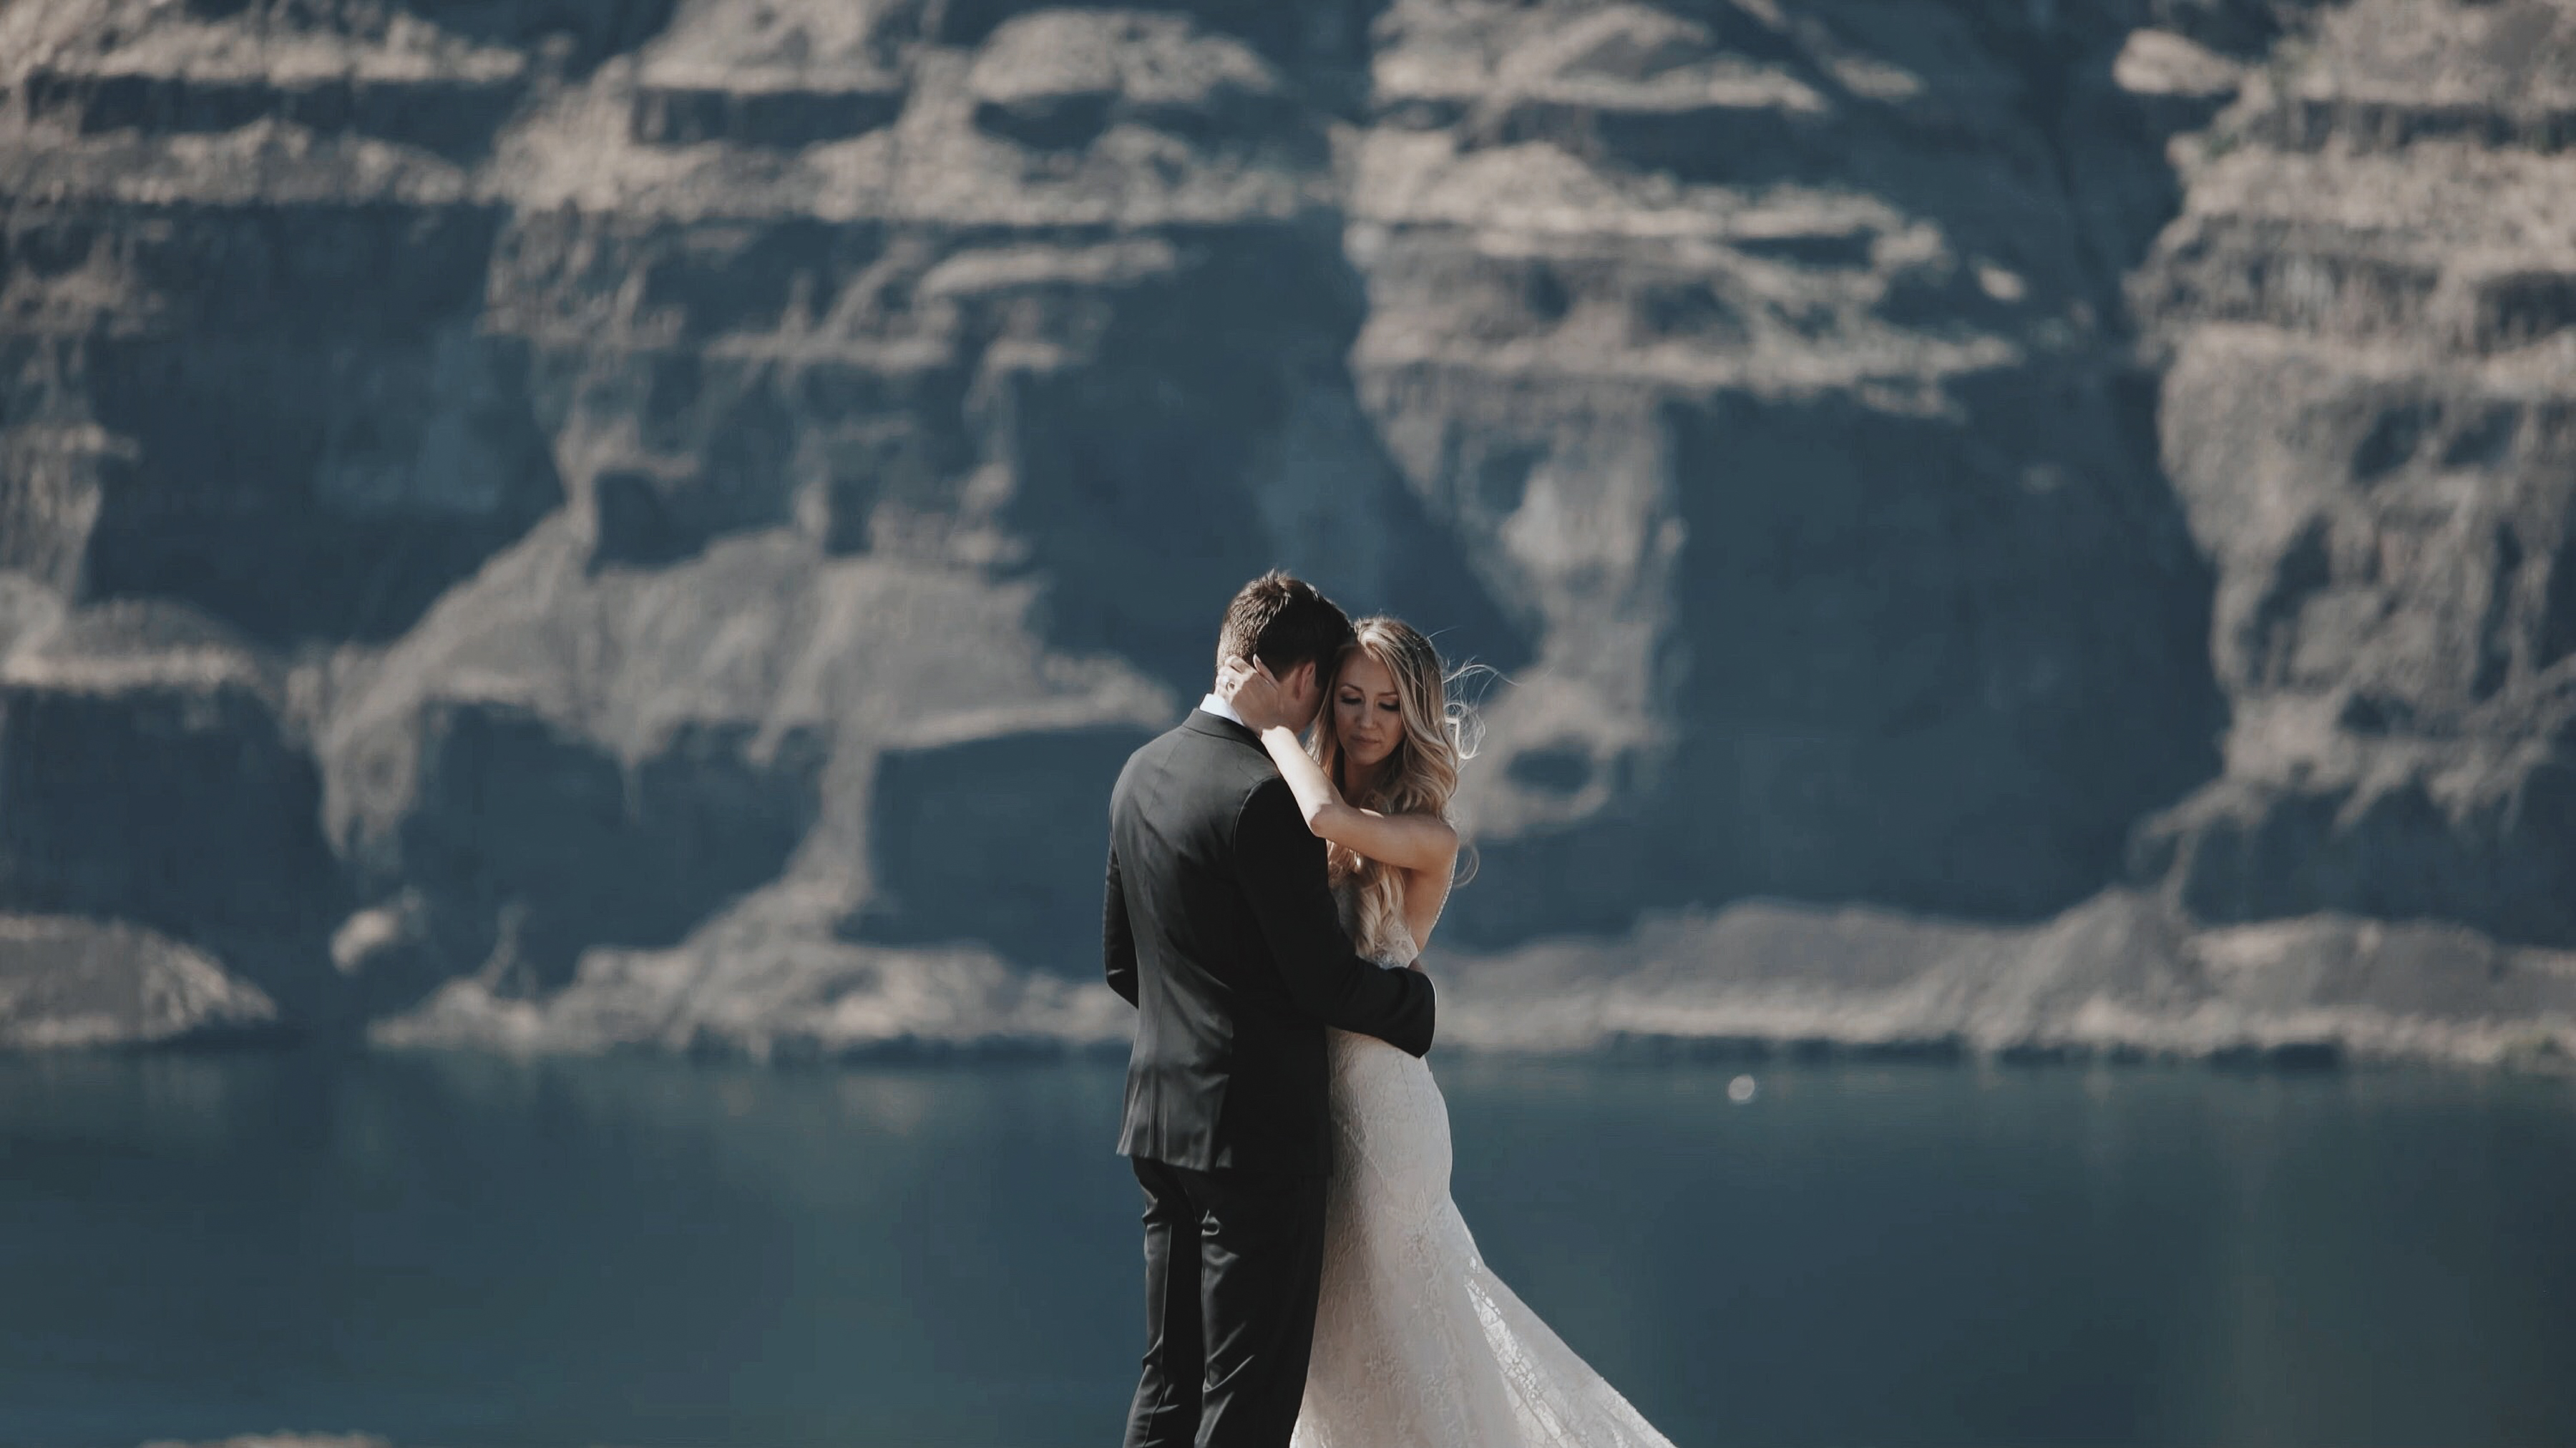 https://sleeklens.com/wp-content/uploads/2018/09/wedding-lightroom-presets-signature-bride-groom-before-12.jpg